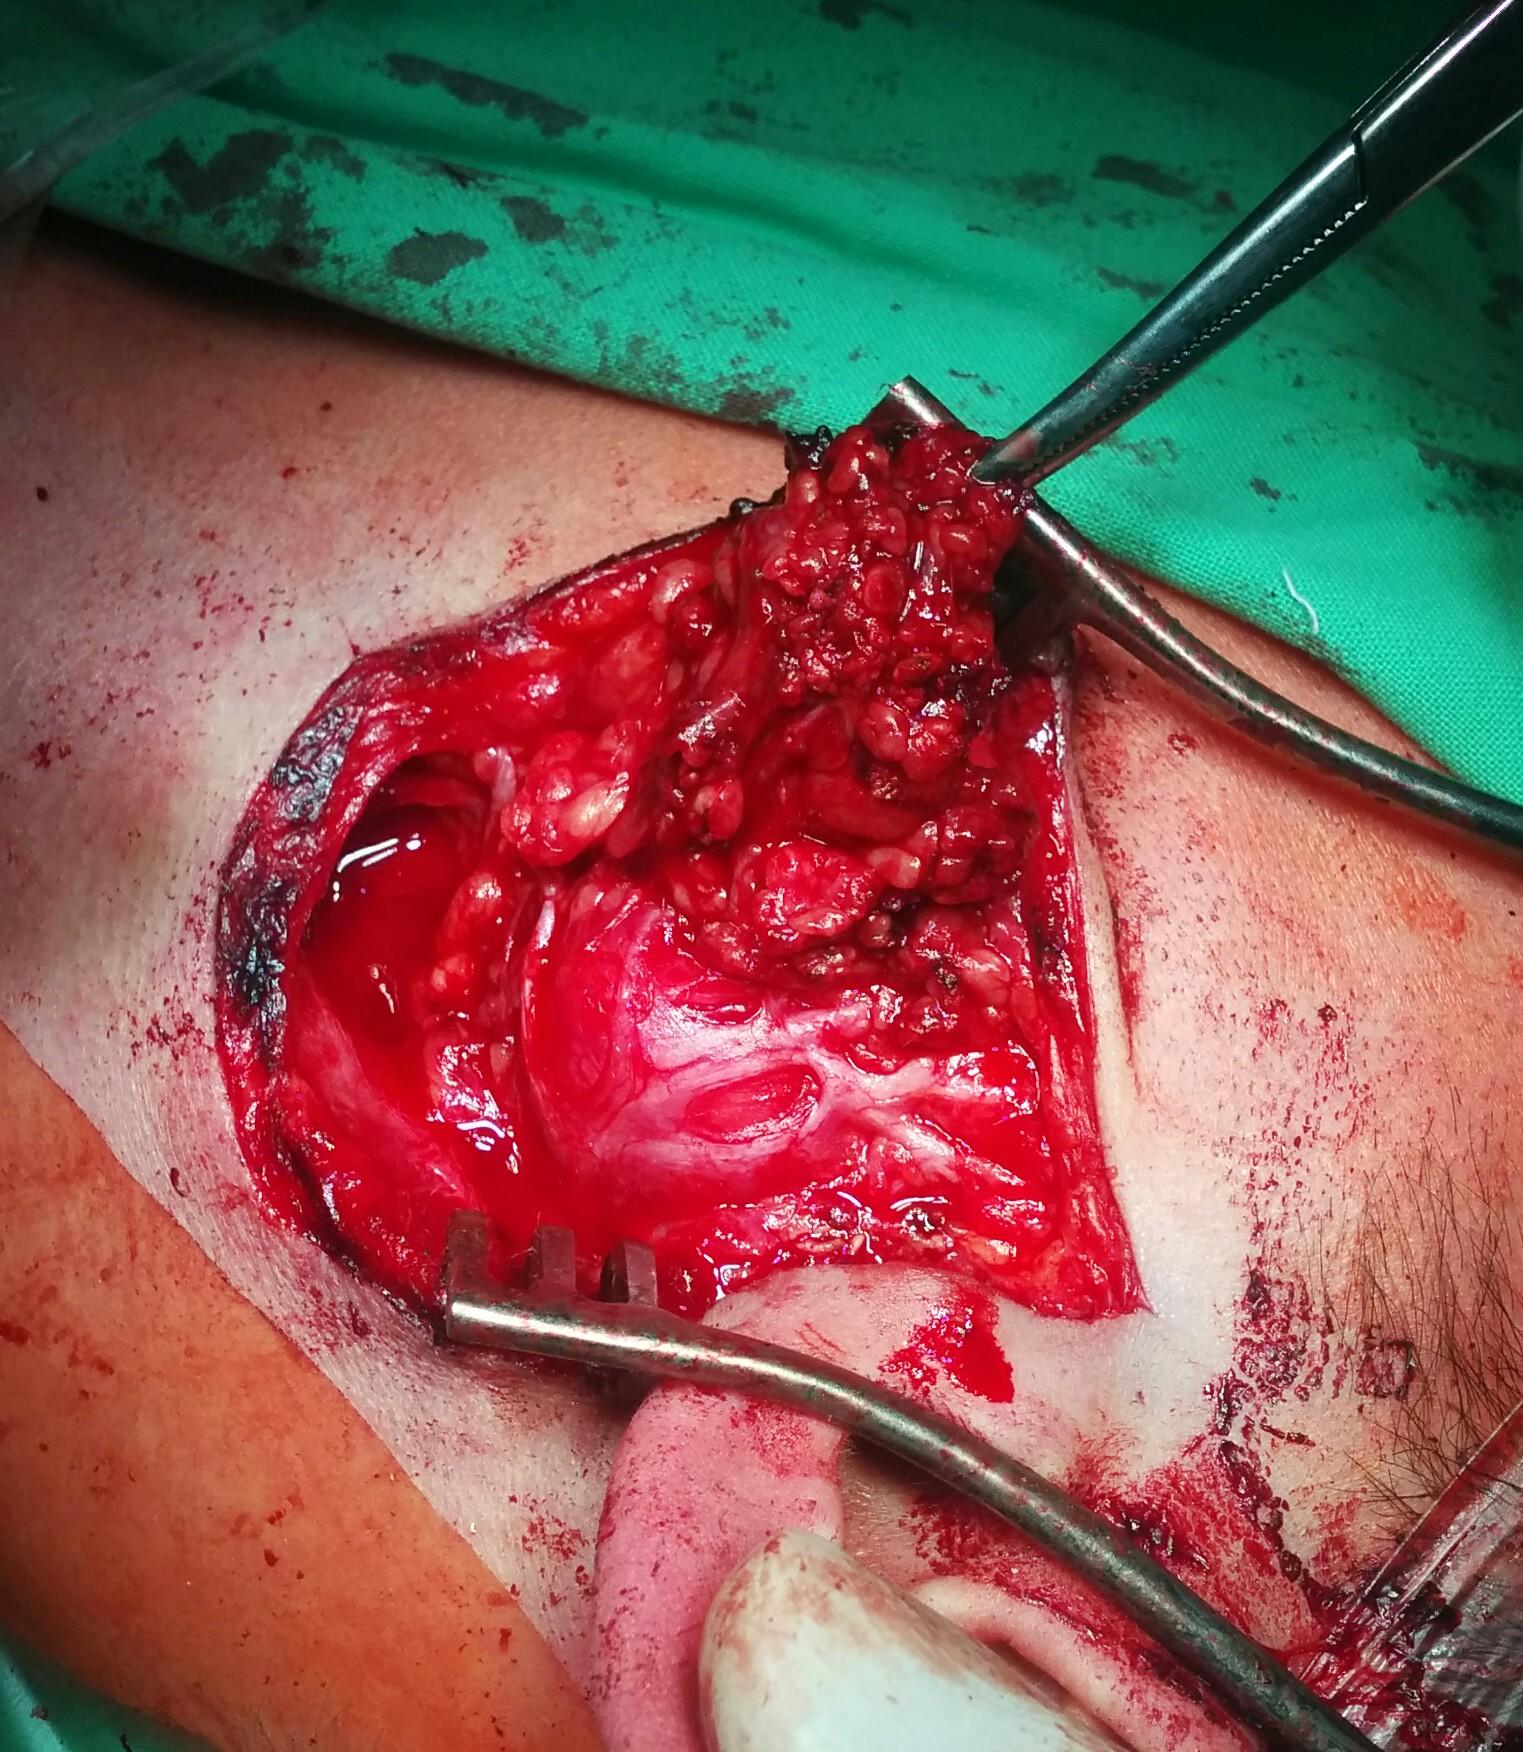 parotis_tumor.jpg